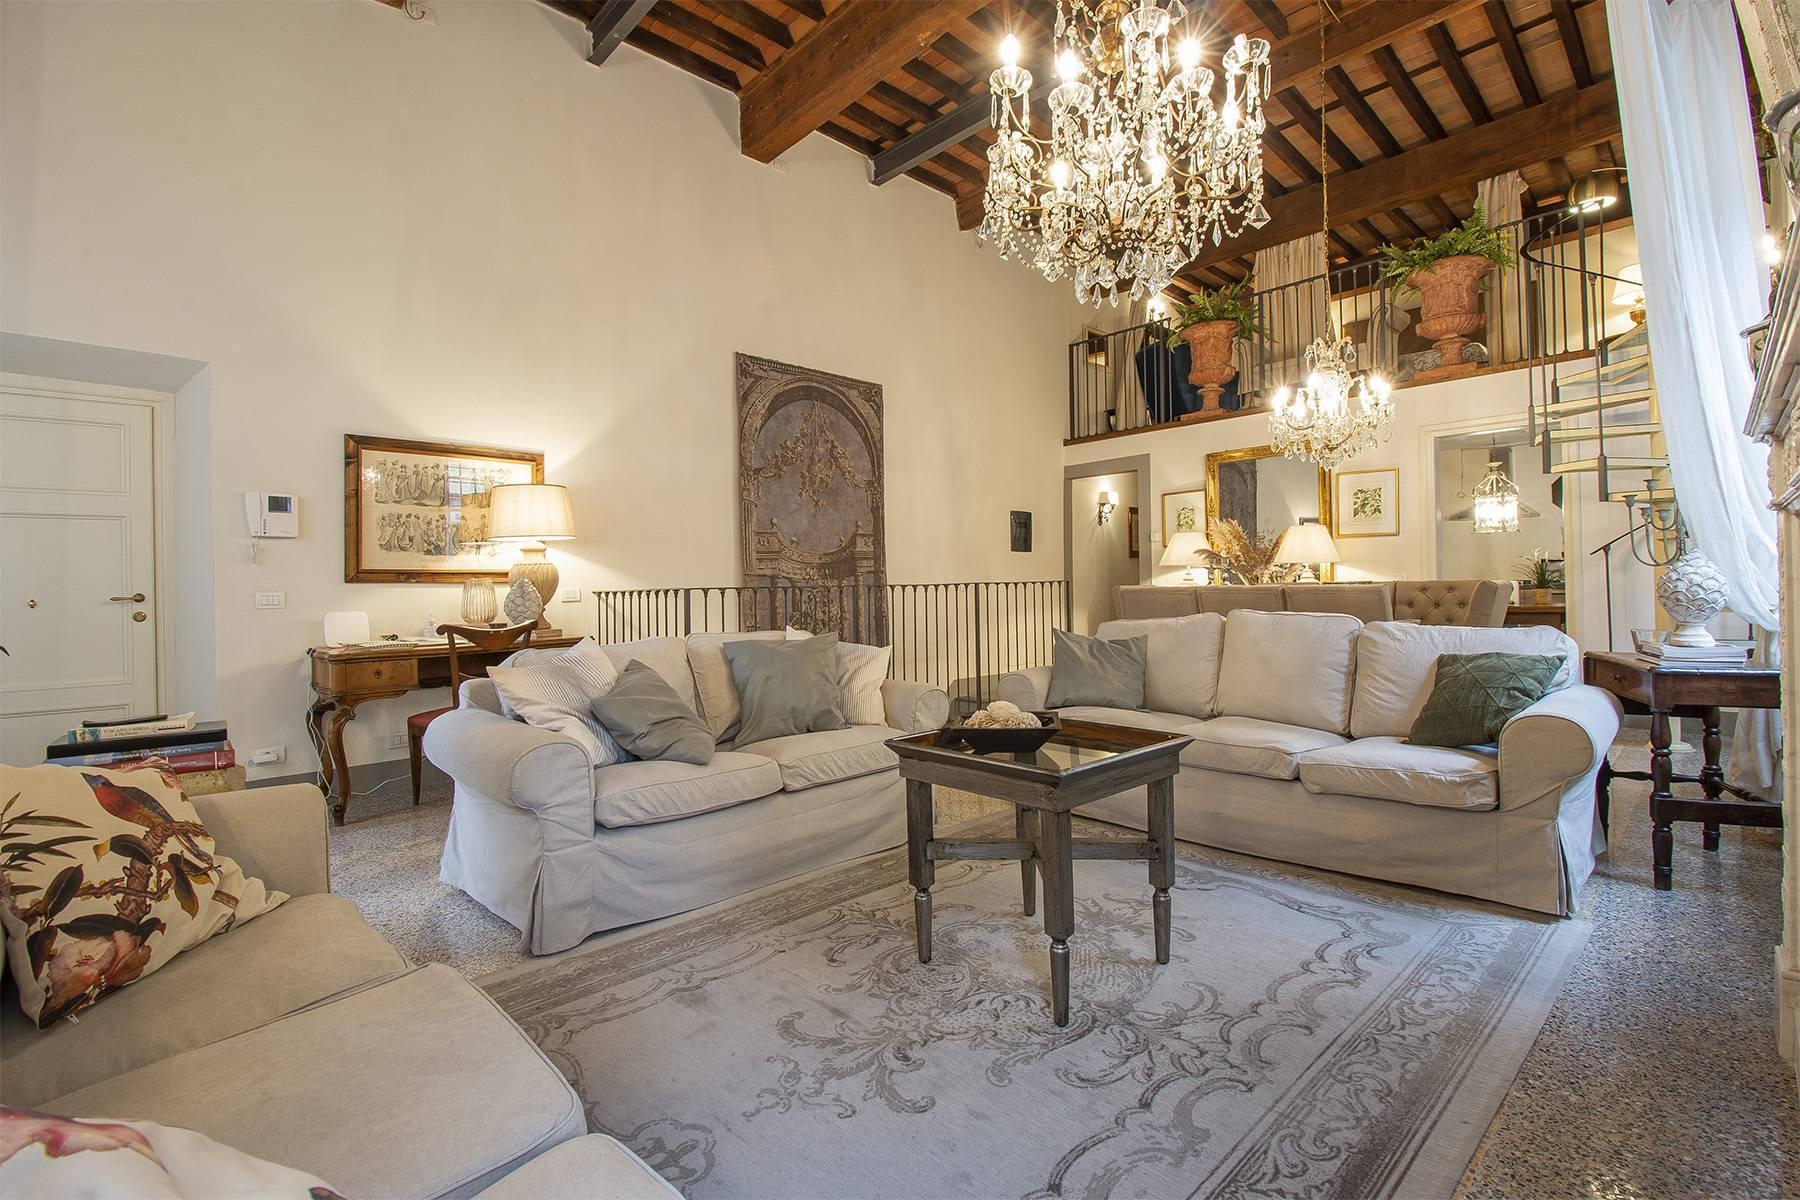 Appartement exclusif au coeur de Lucca - 1